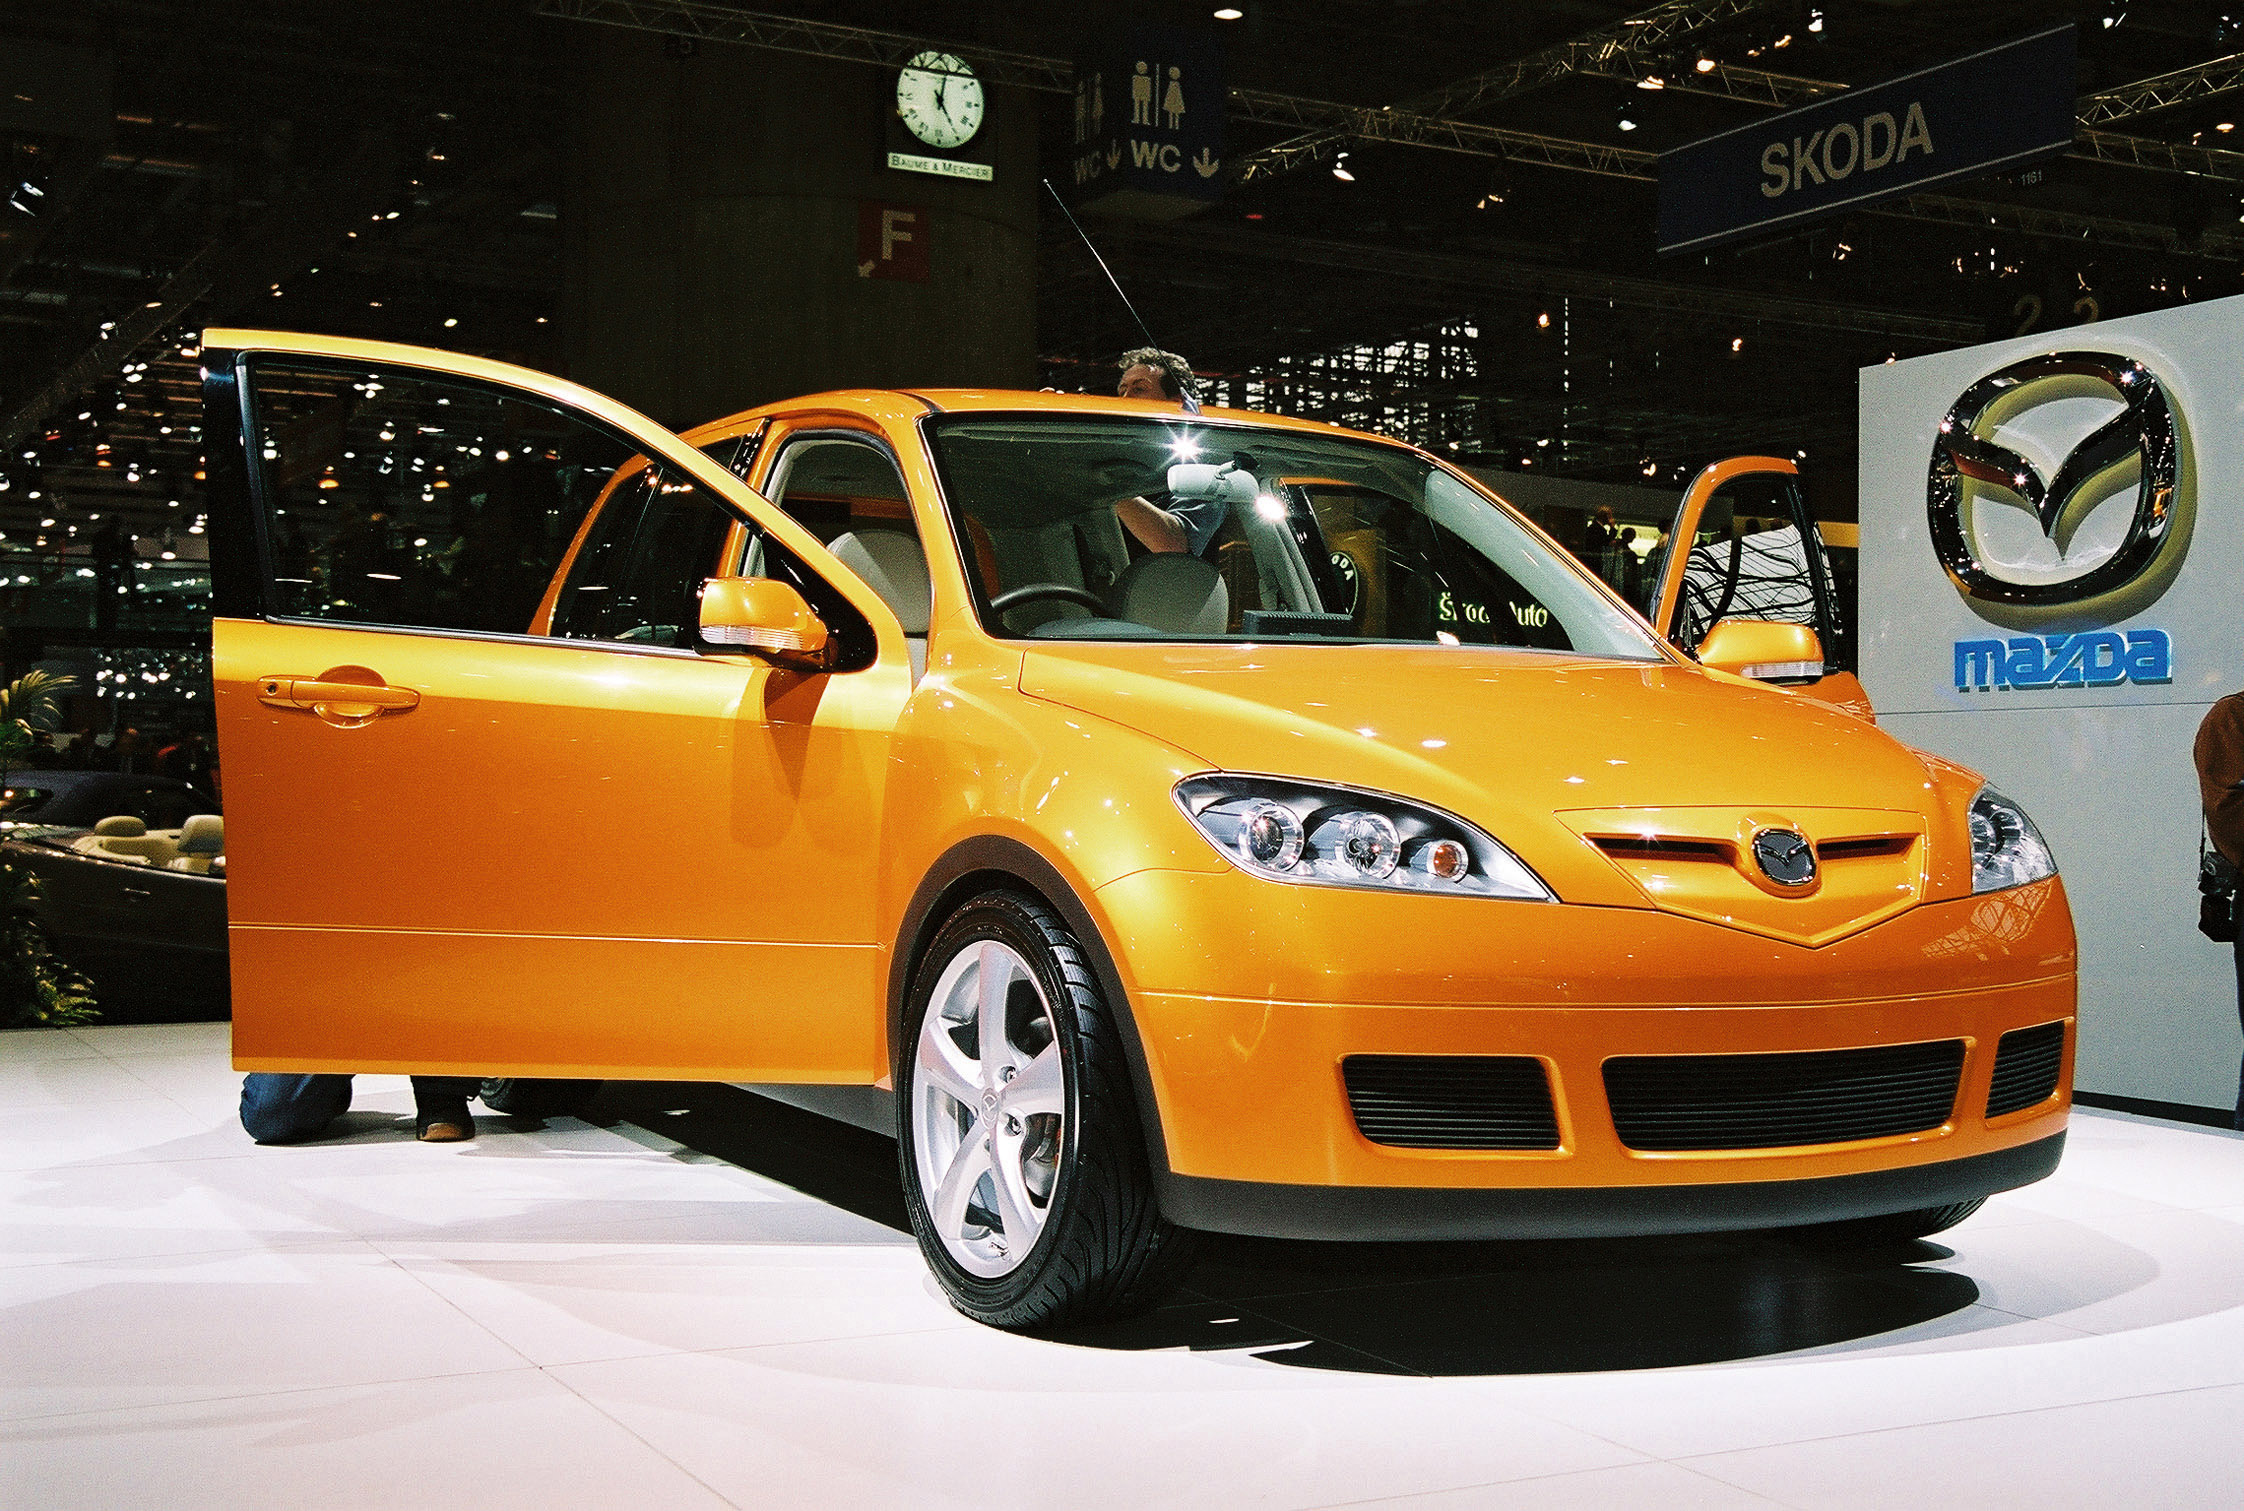 2002 Mazda MX Sport Runabout Concept - HD Pictures @ carsinvasion.com